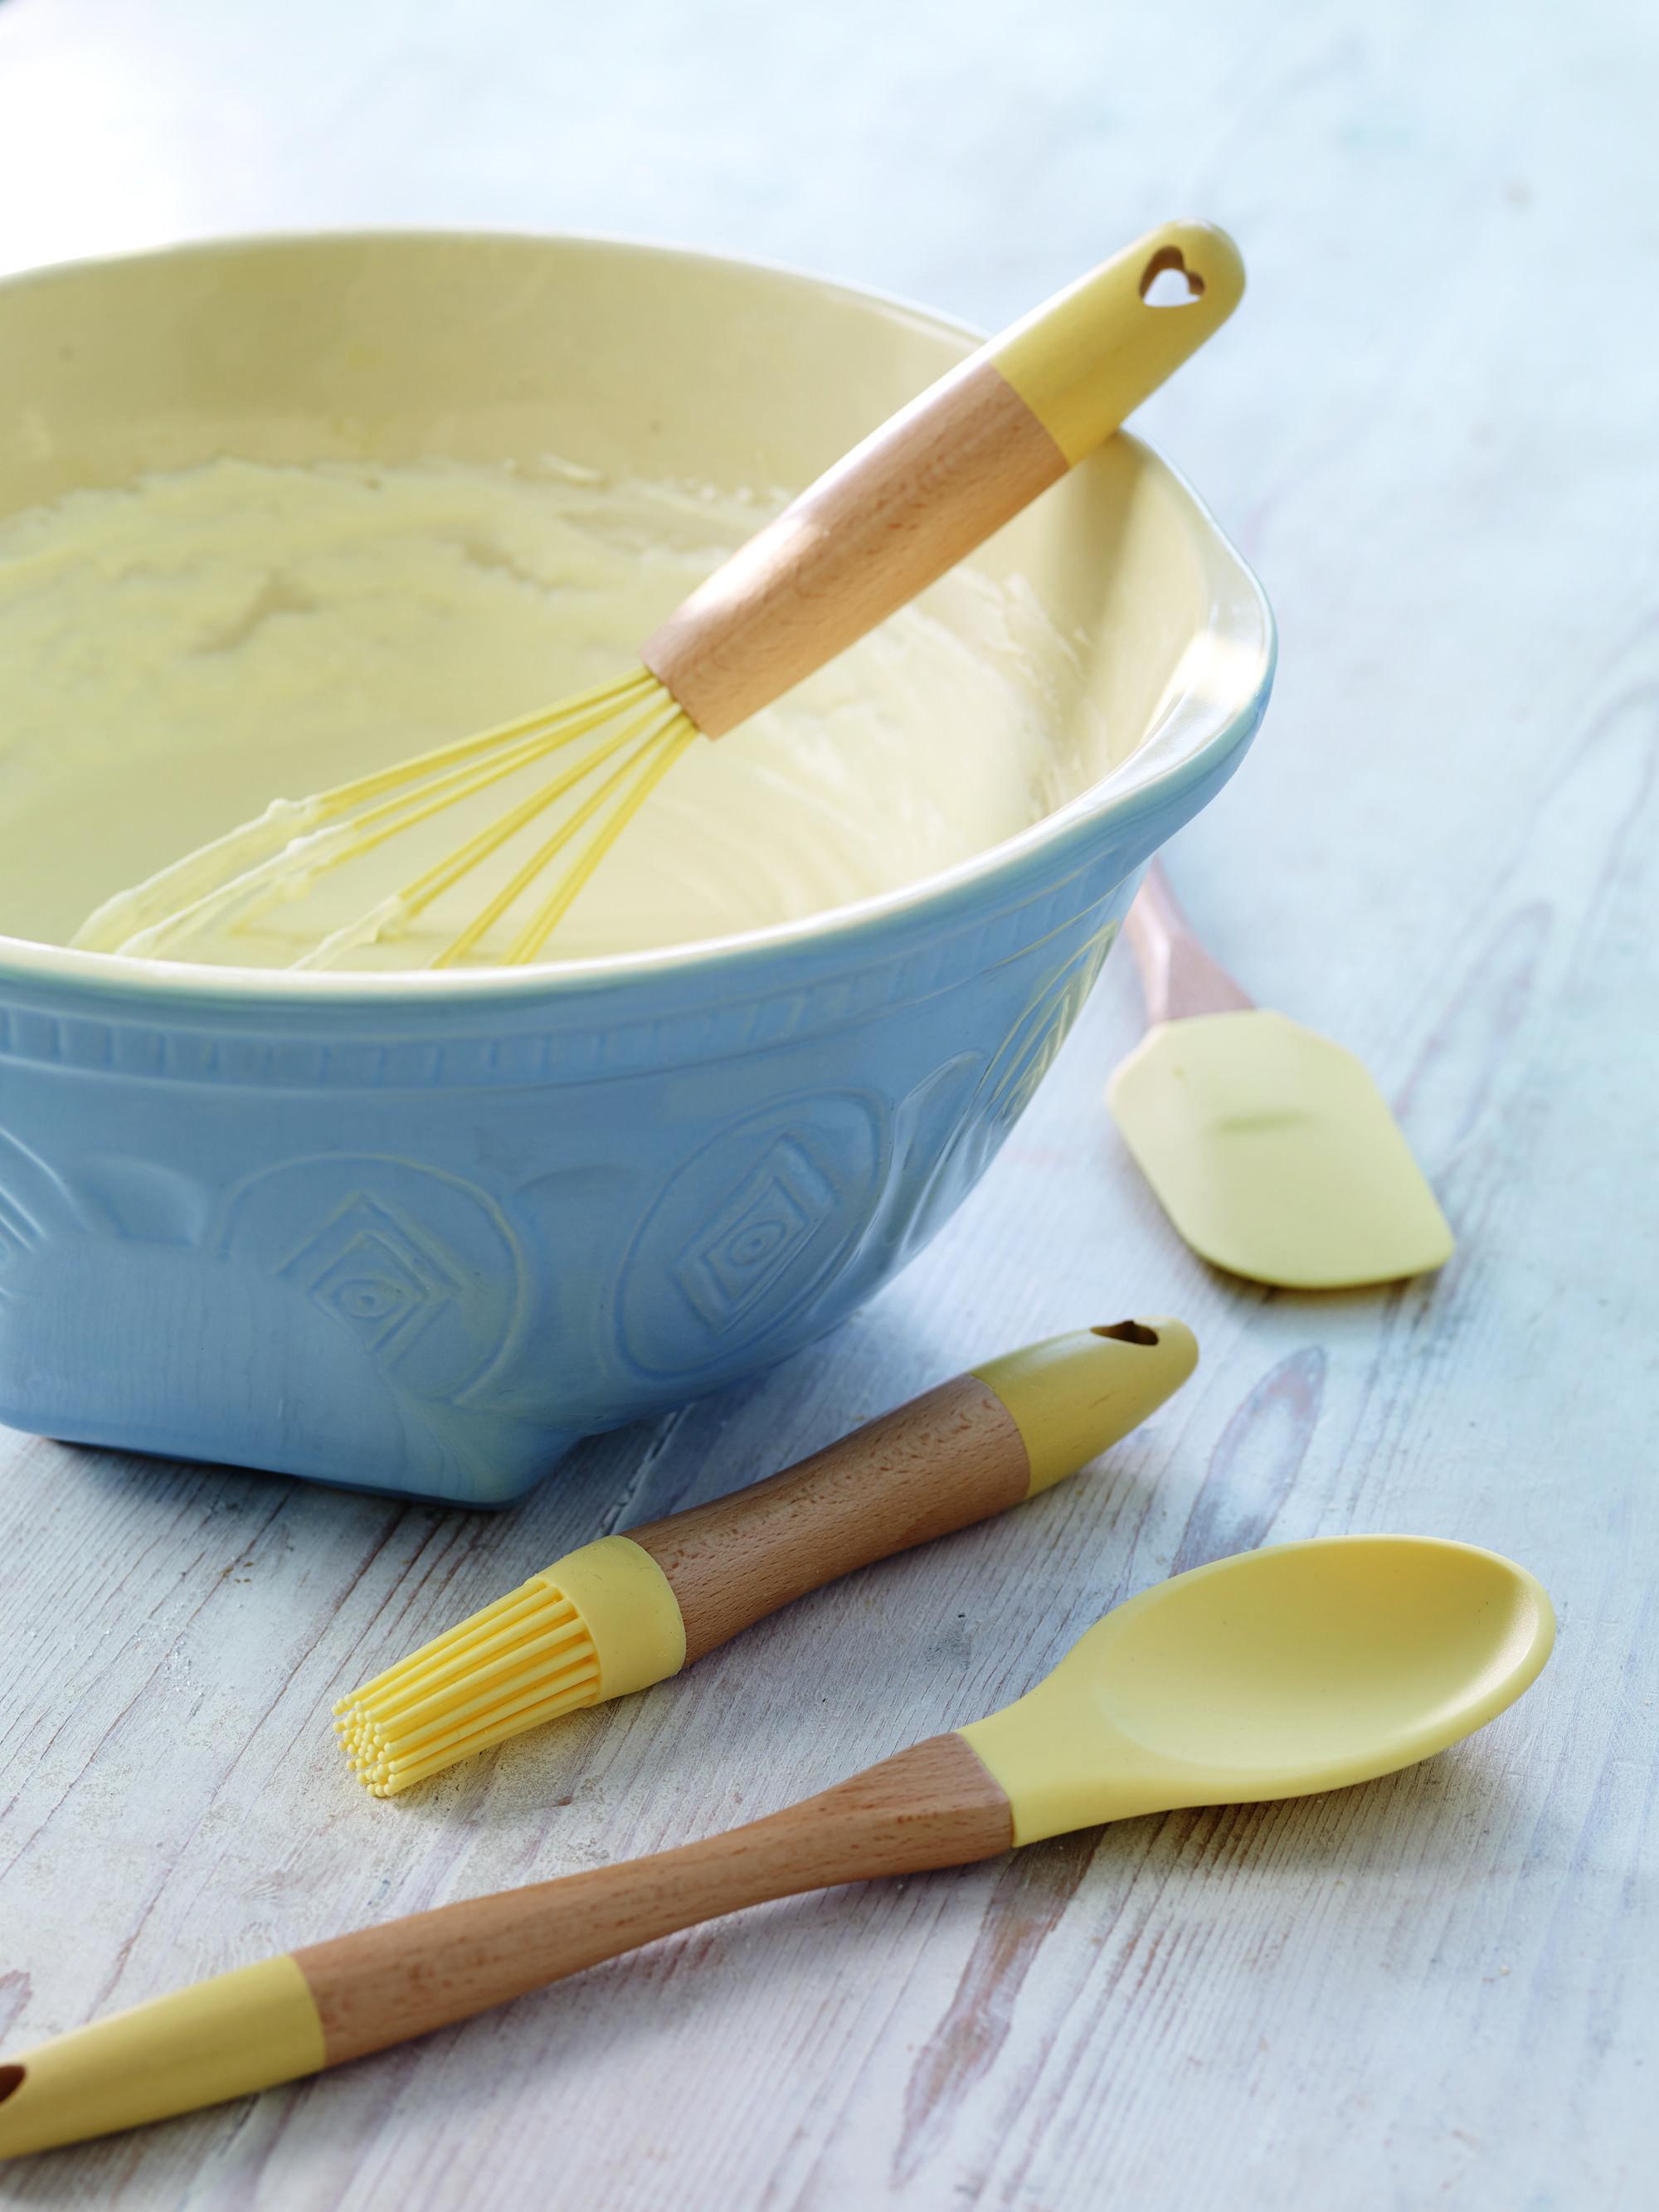 This Baking Set From Debenhams Makes A Great Colourful